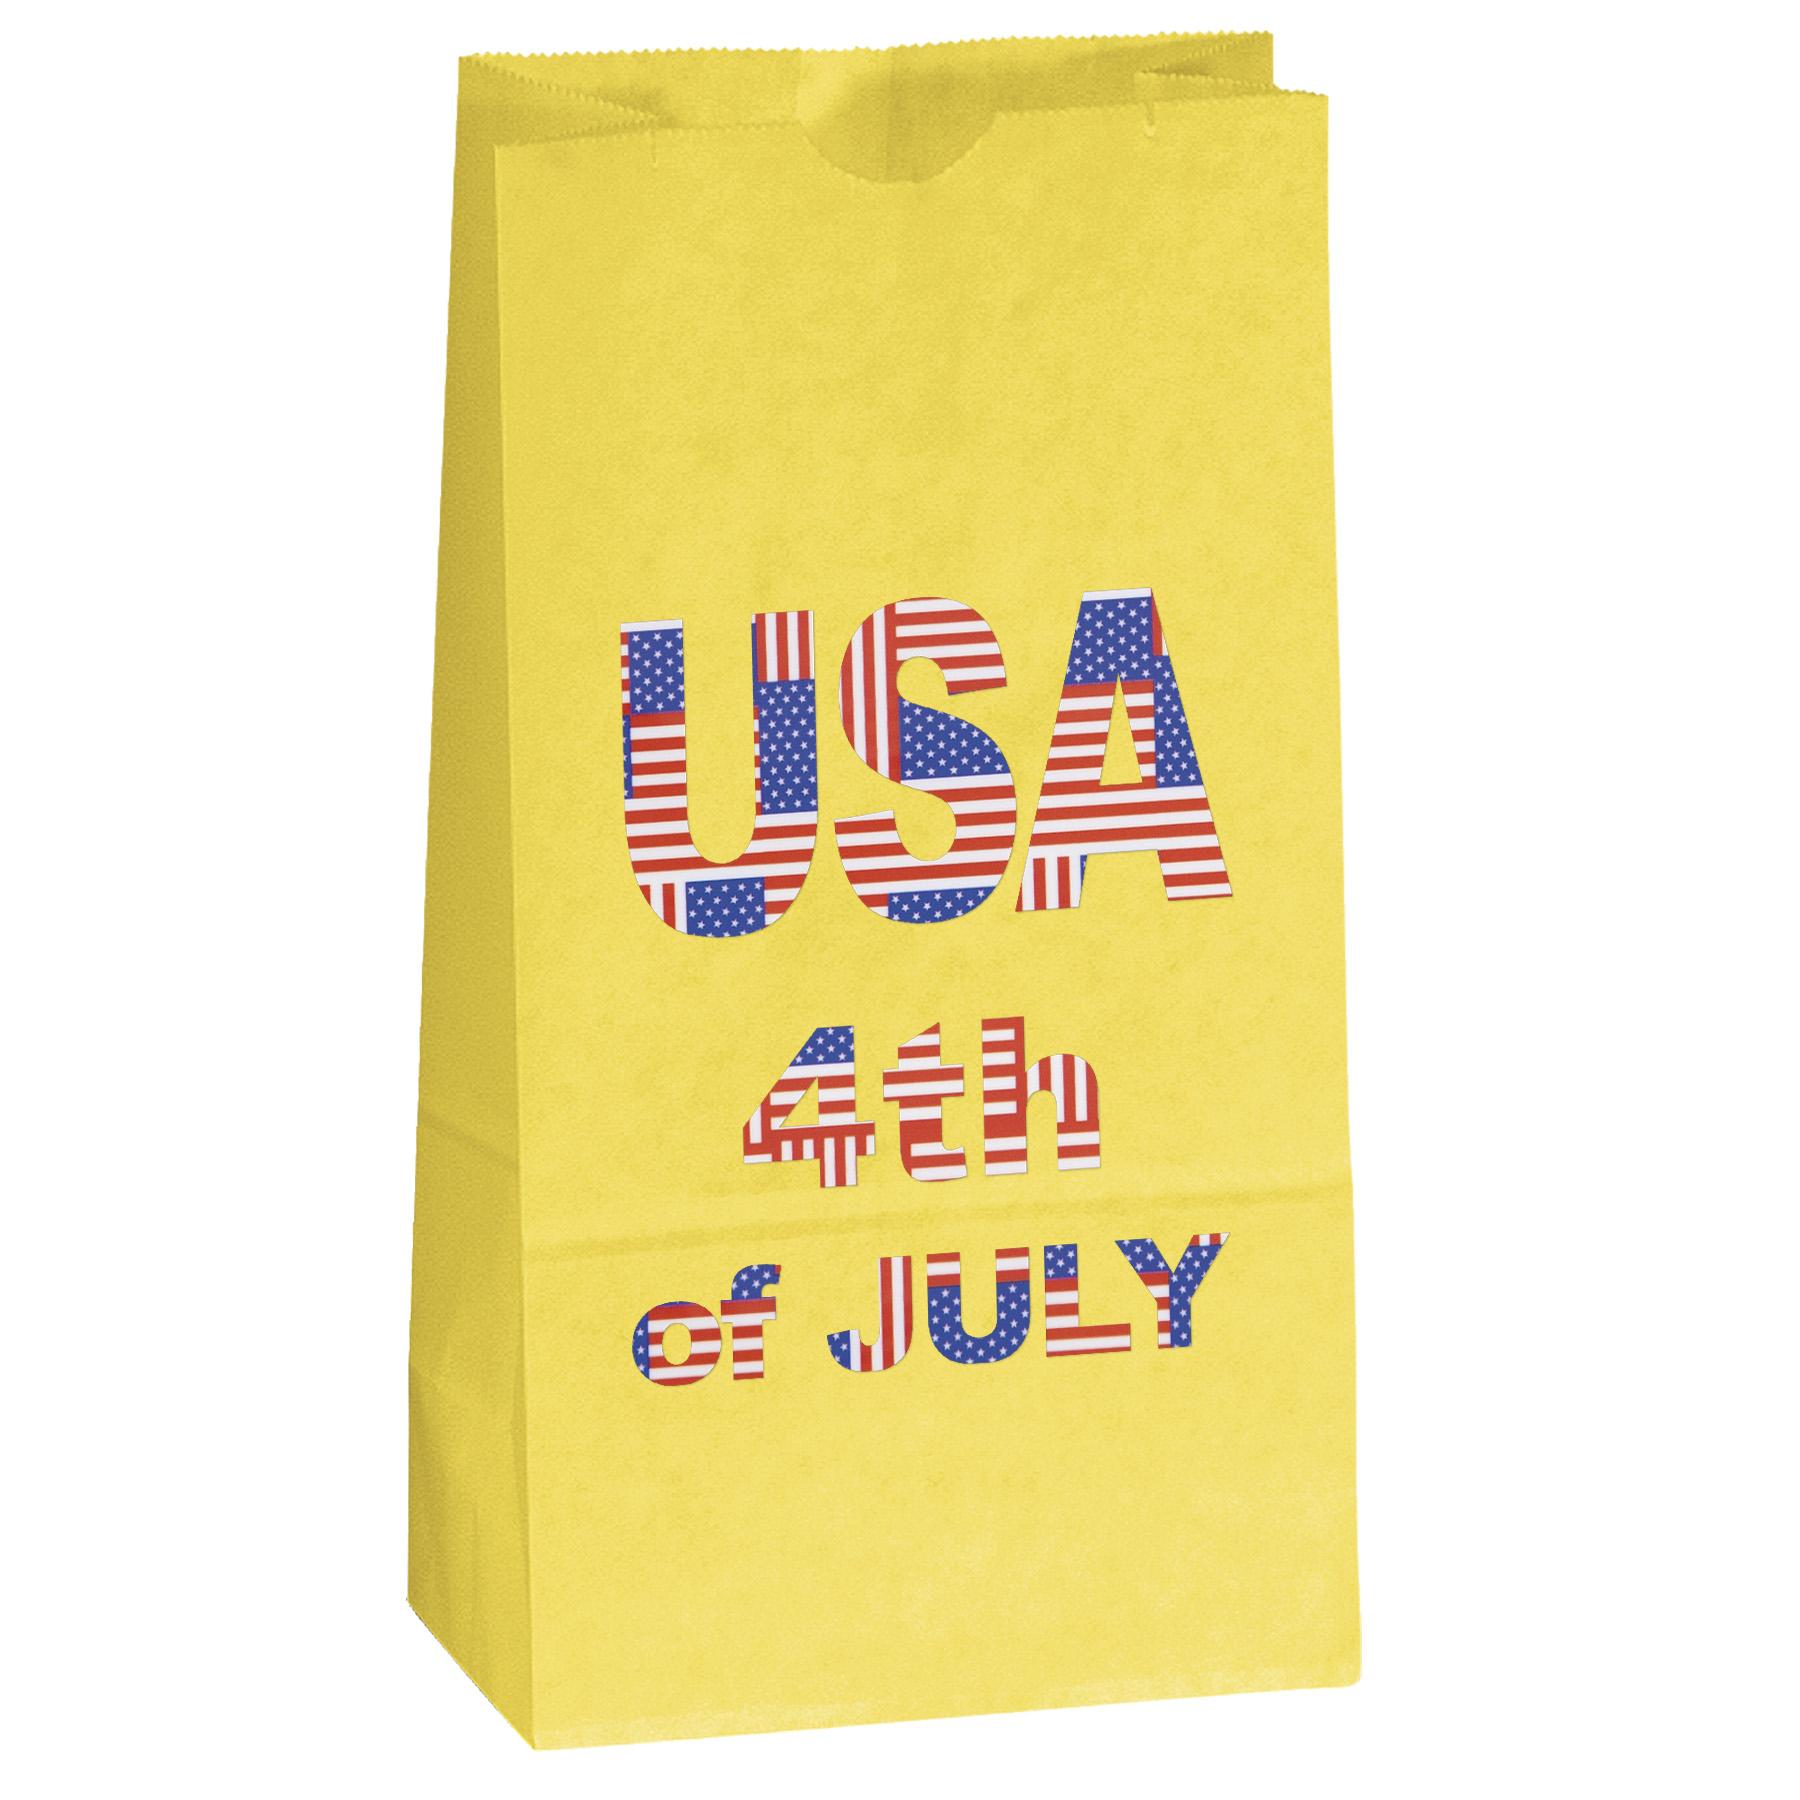 Popcorn Bag - Colored Bag (Brilliance- Special Finish)